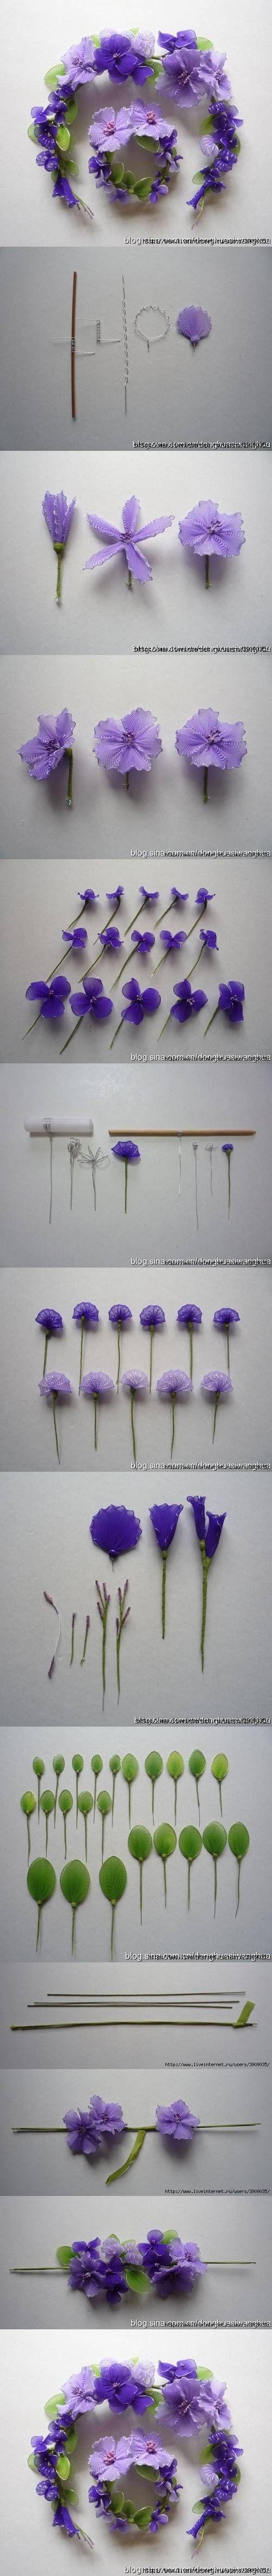 74 best flower id fun images on pinterest branches flower diy tutorial by diyforever izmirmasajfo